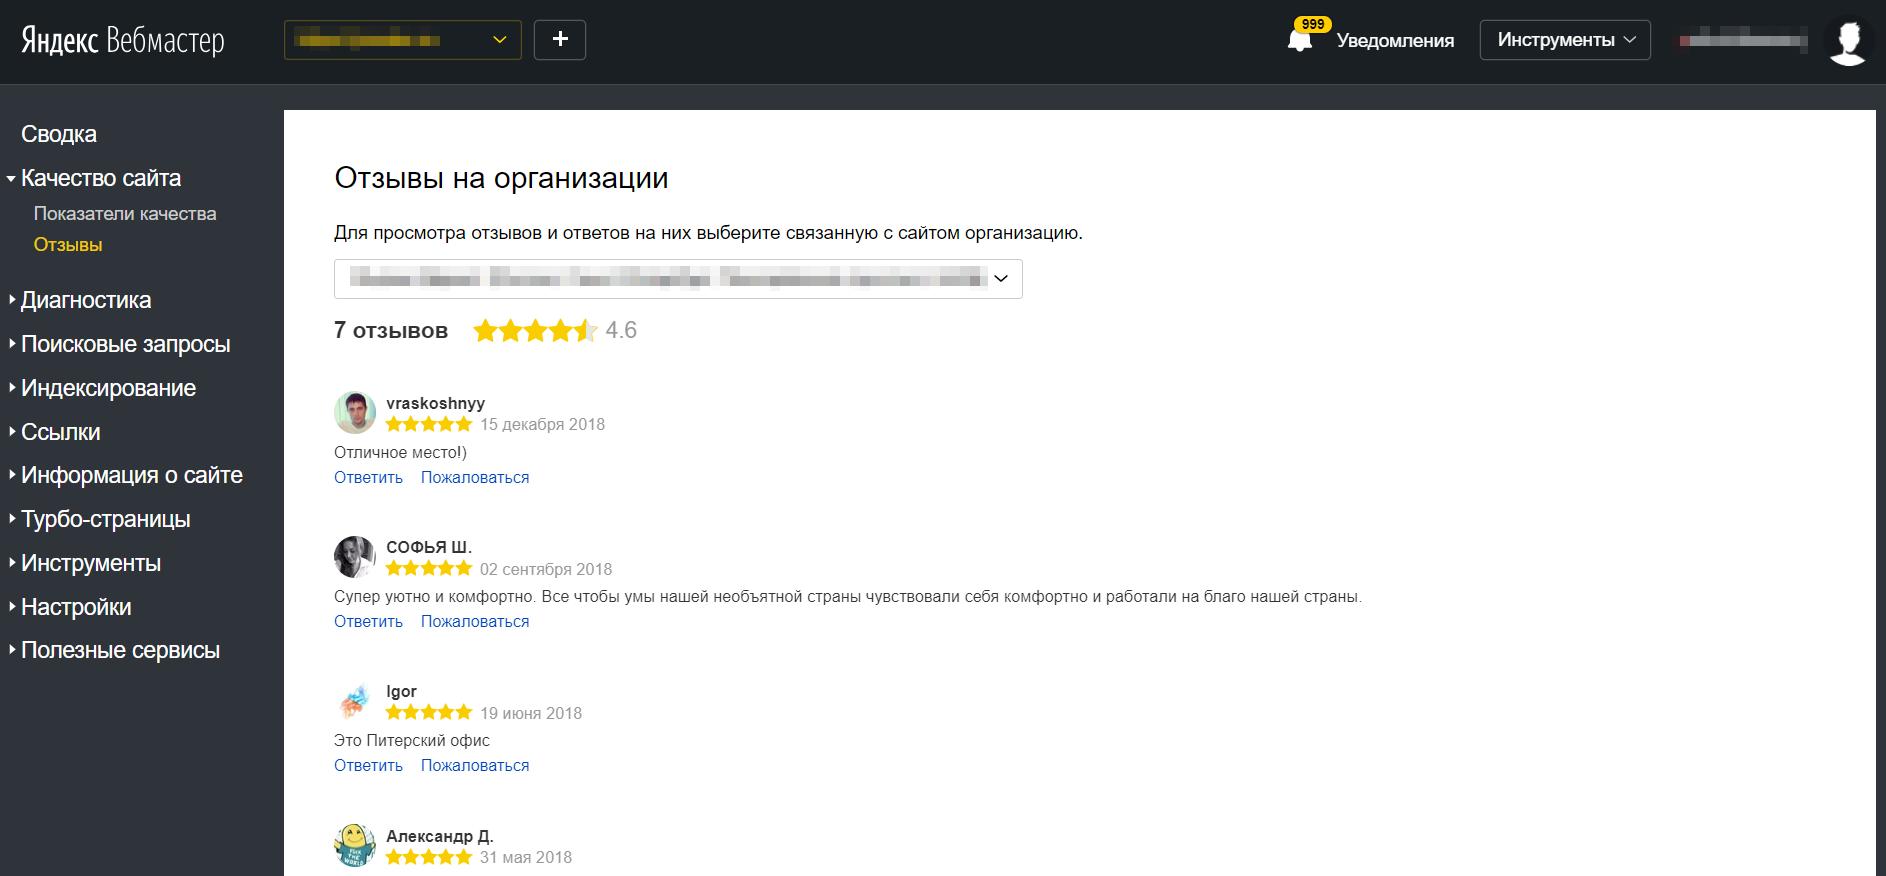 Нововведения Яндекса за последний месяц